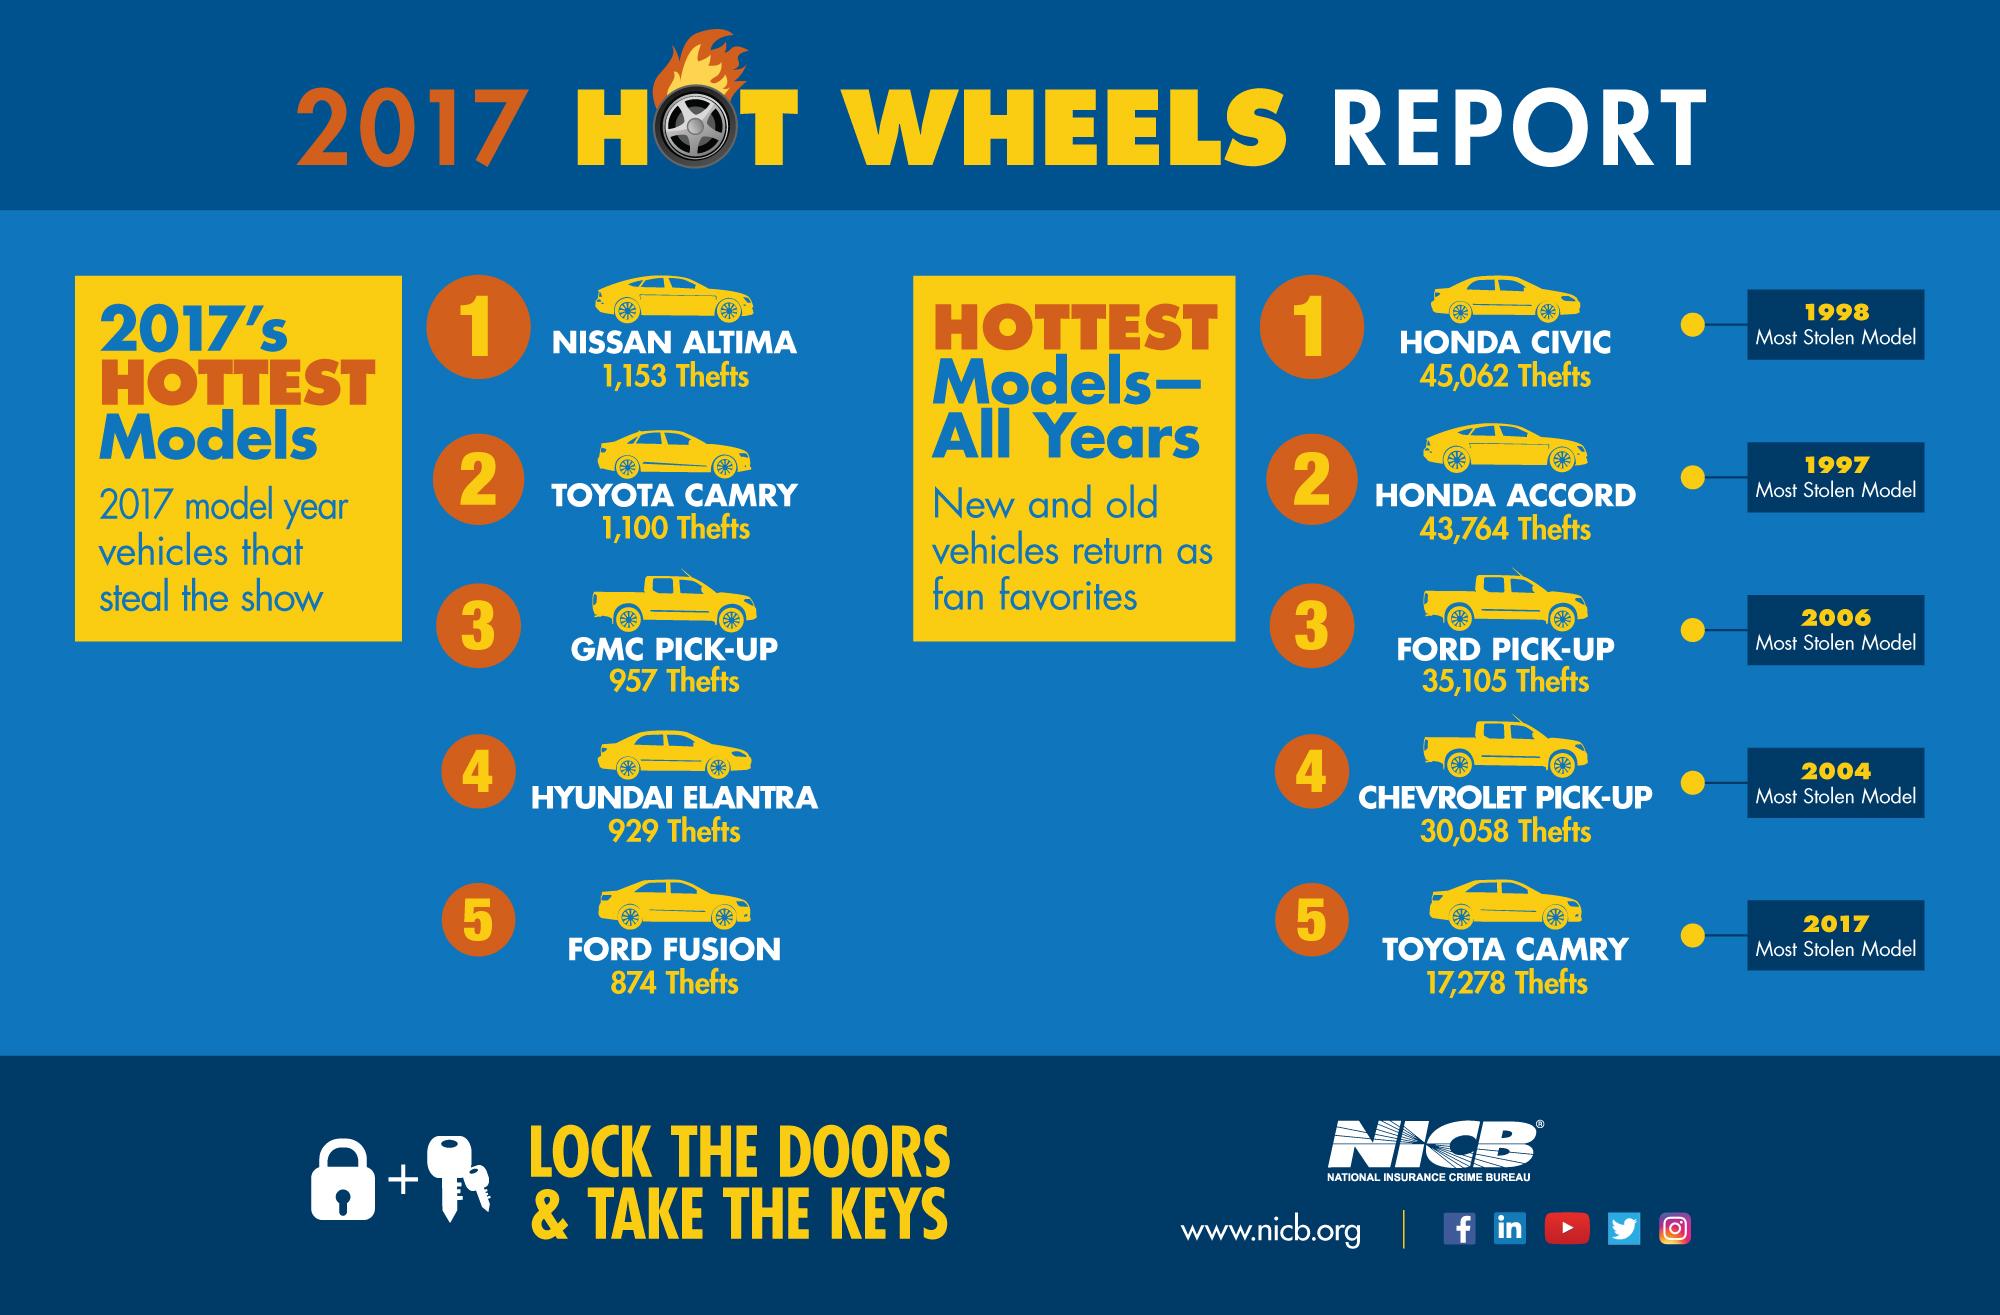 2017 Hot Wheels Report